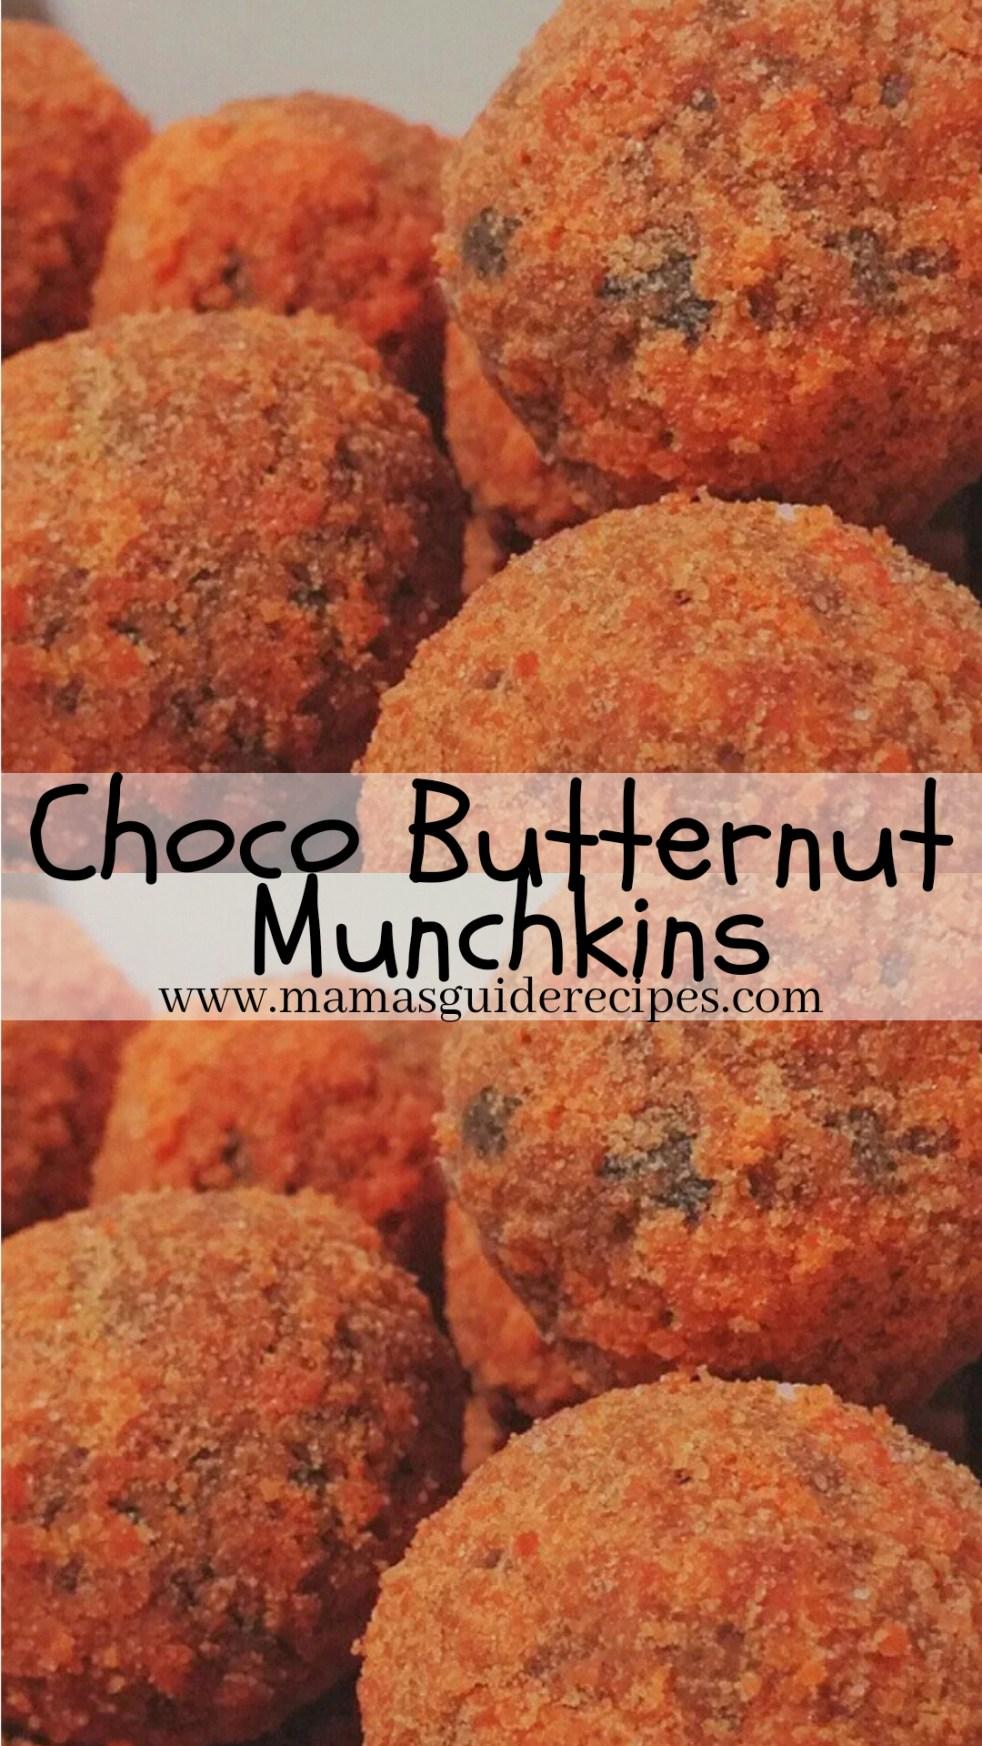 Choco Butternut Munchkins